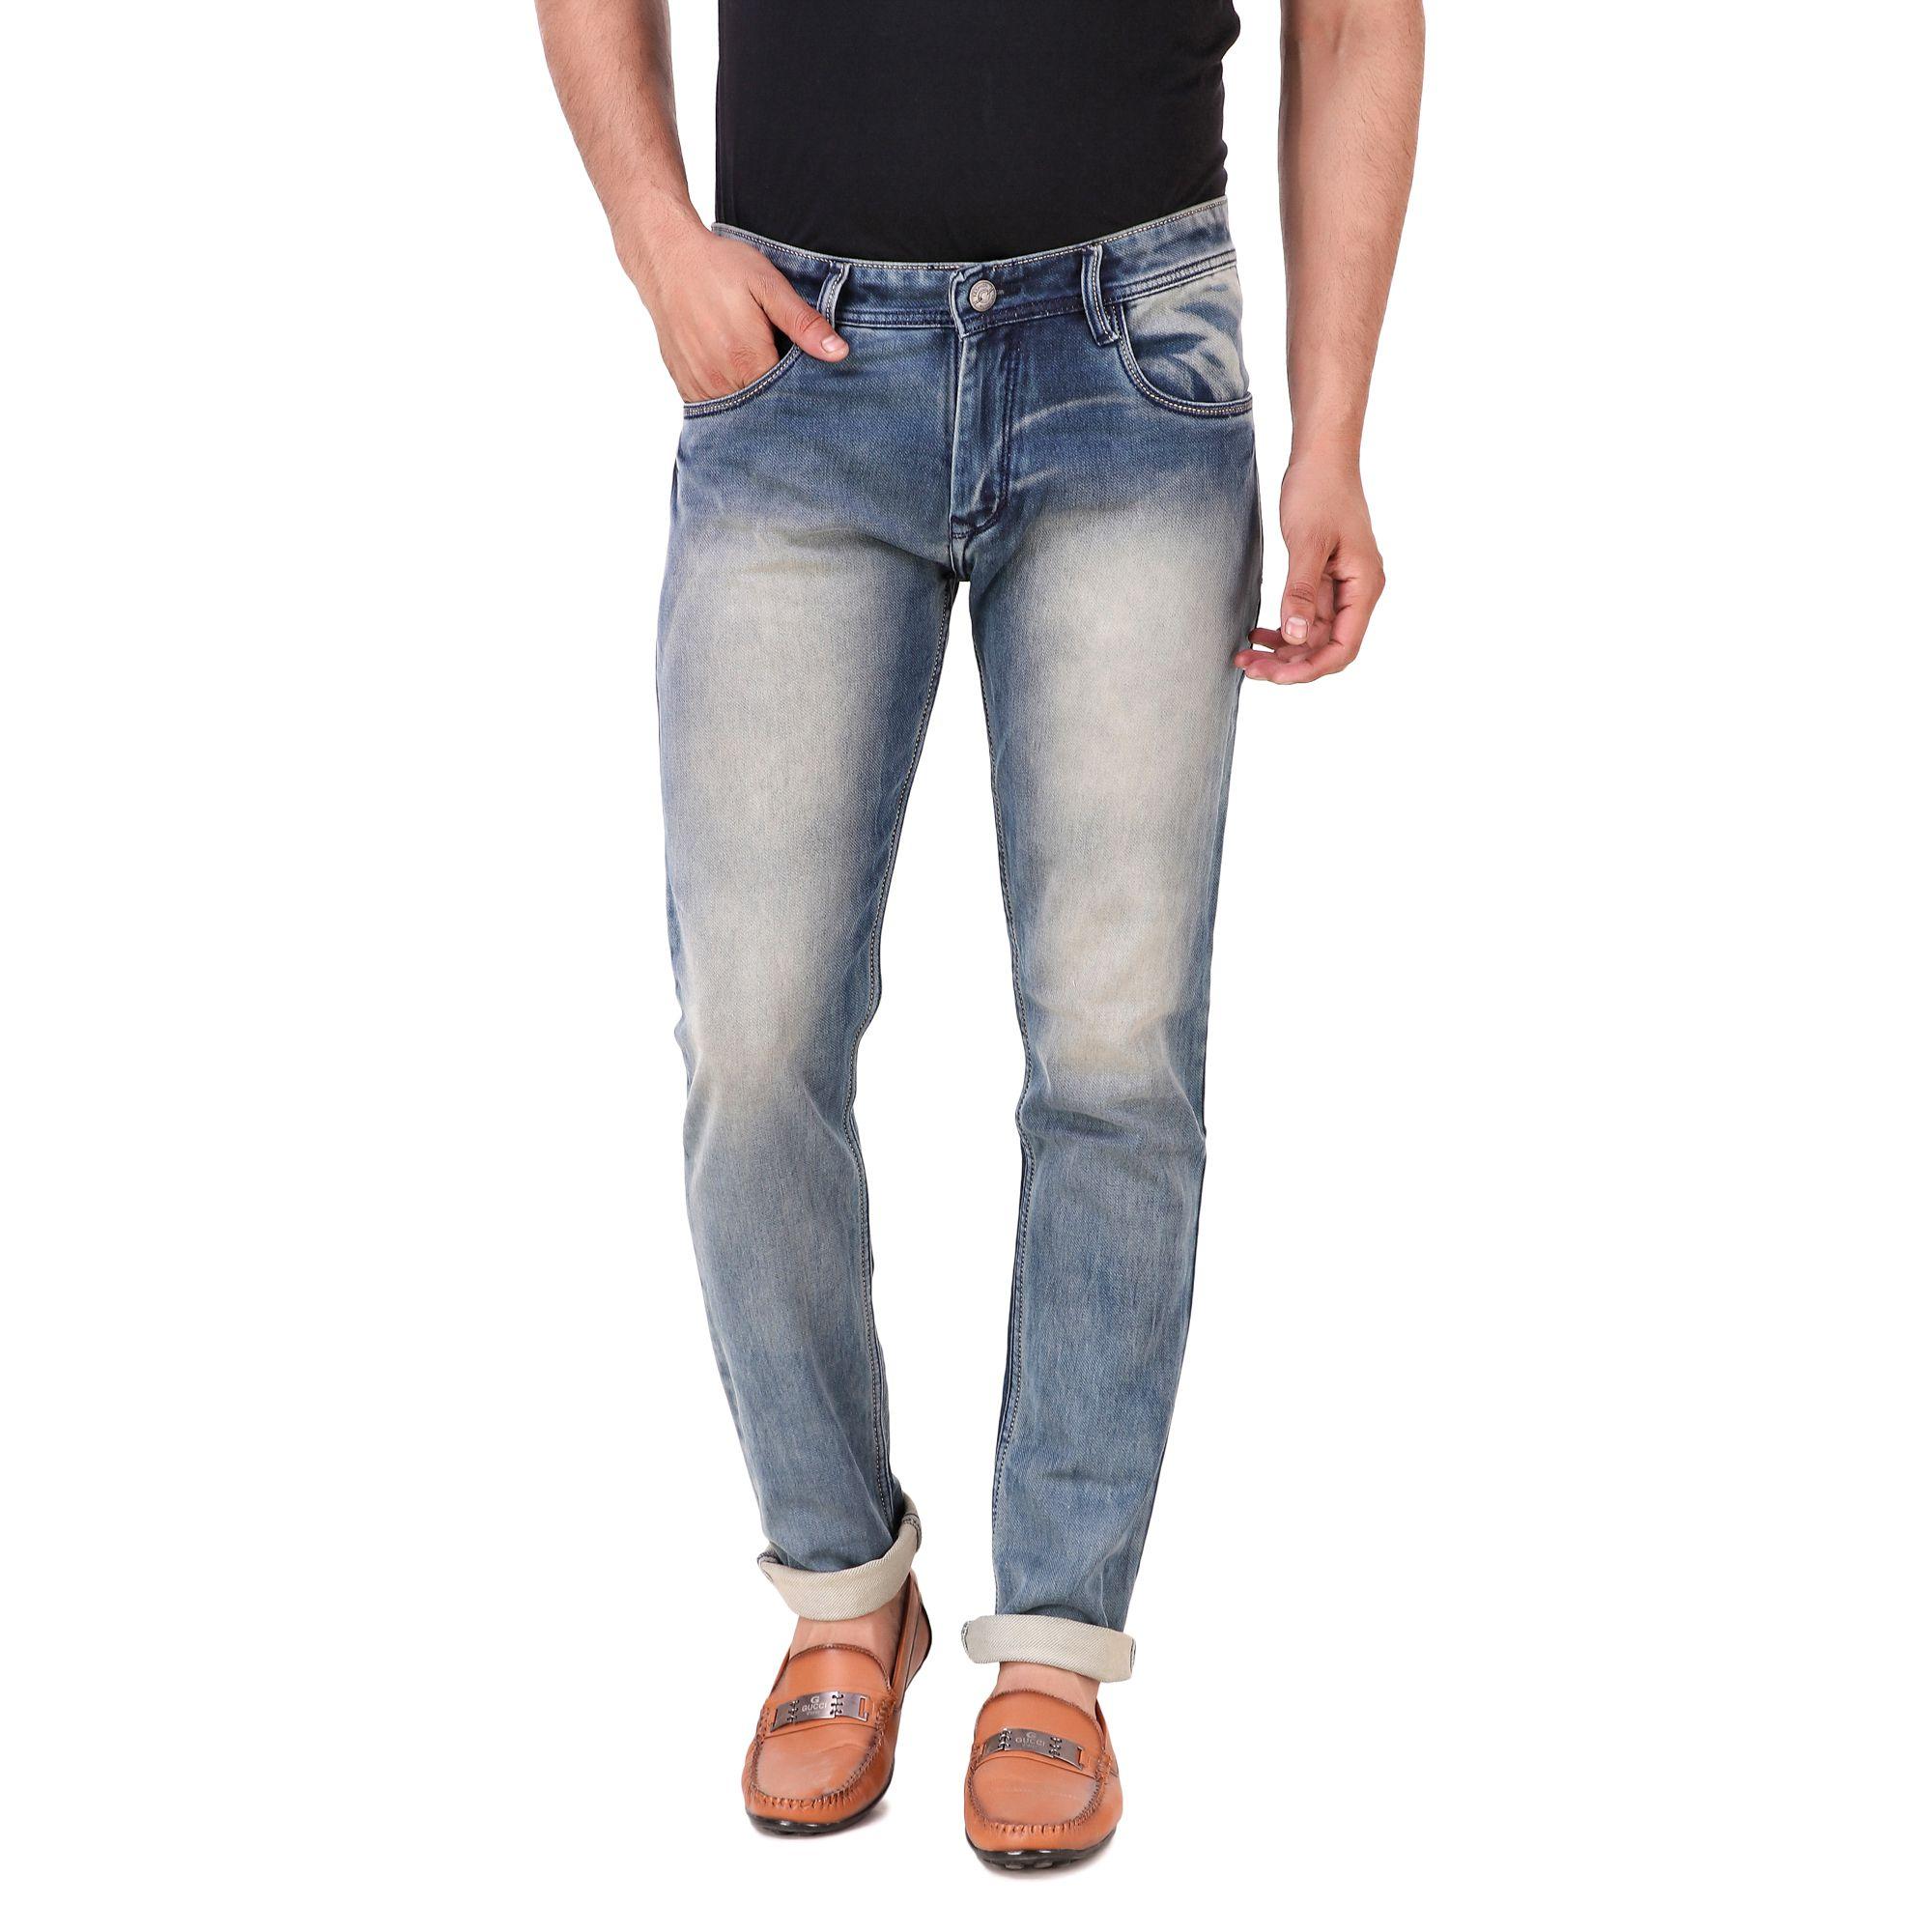 Jaibros Light Blue Slim Jeans